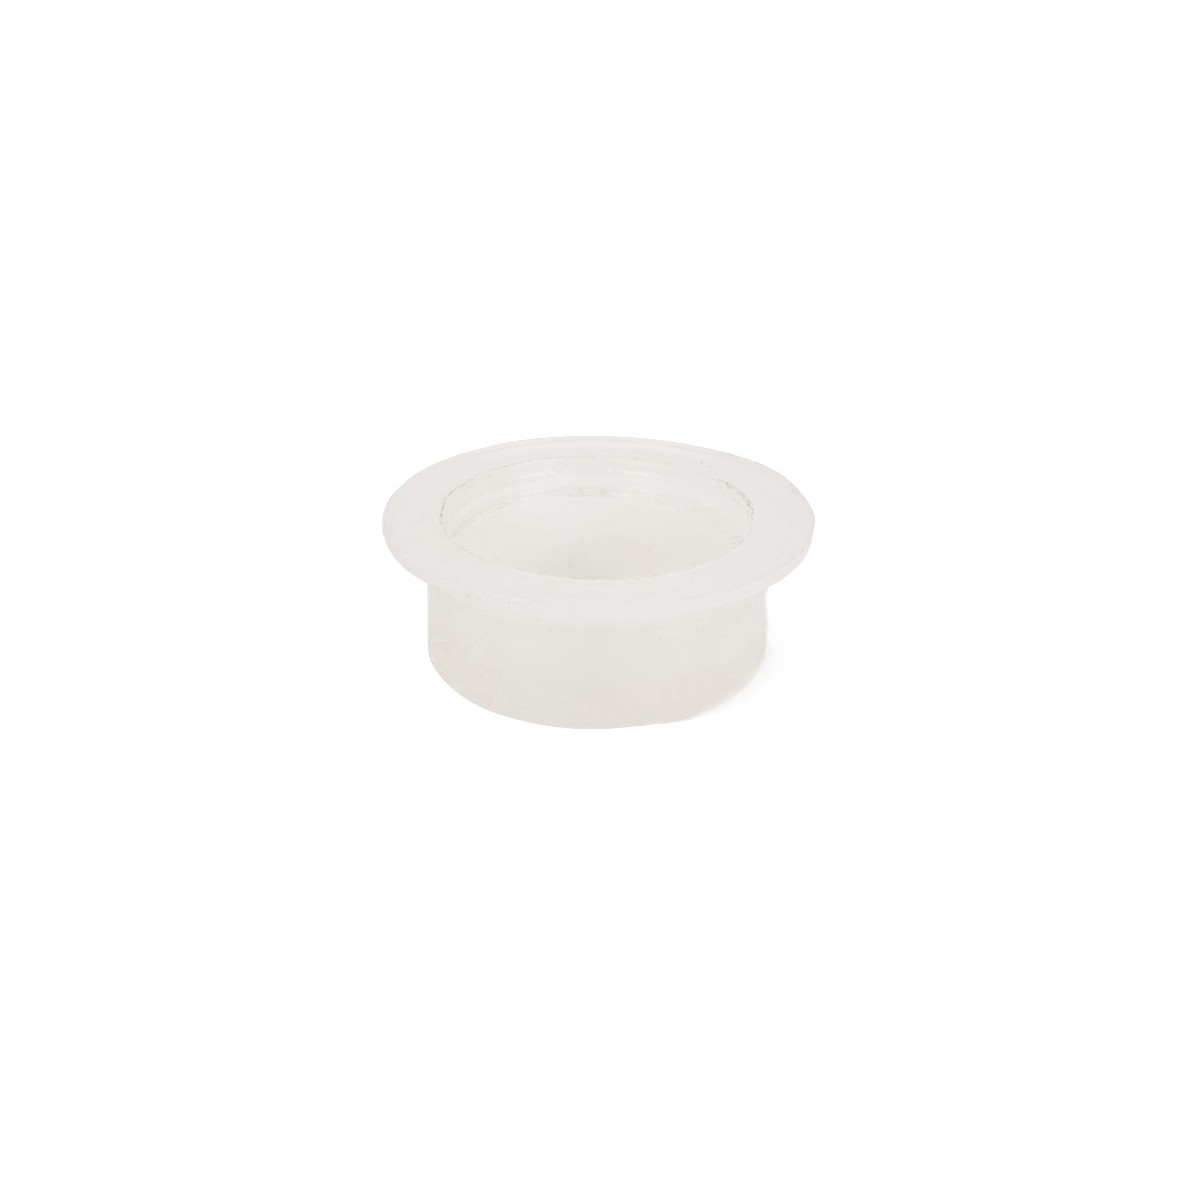 Bouchon SHADOW CONSPIRACY multitool plastic tool